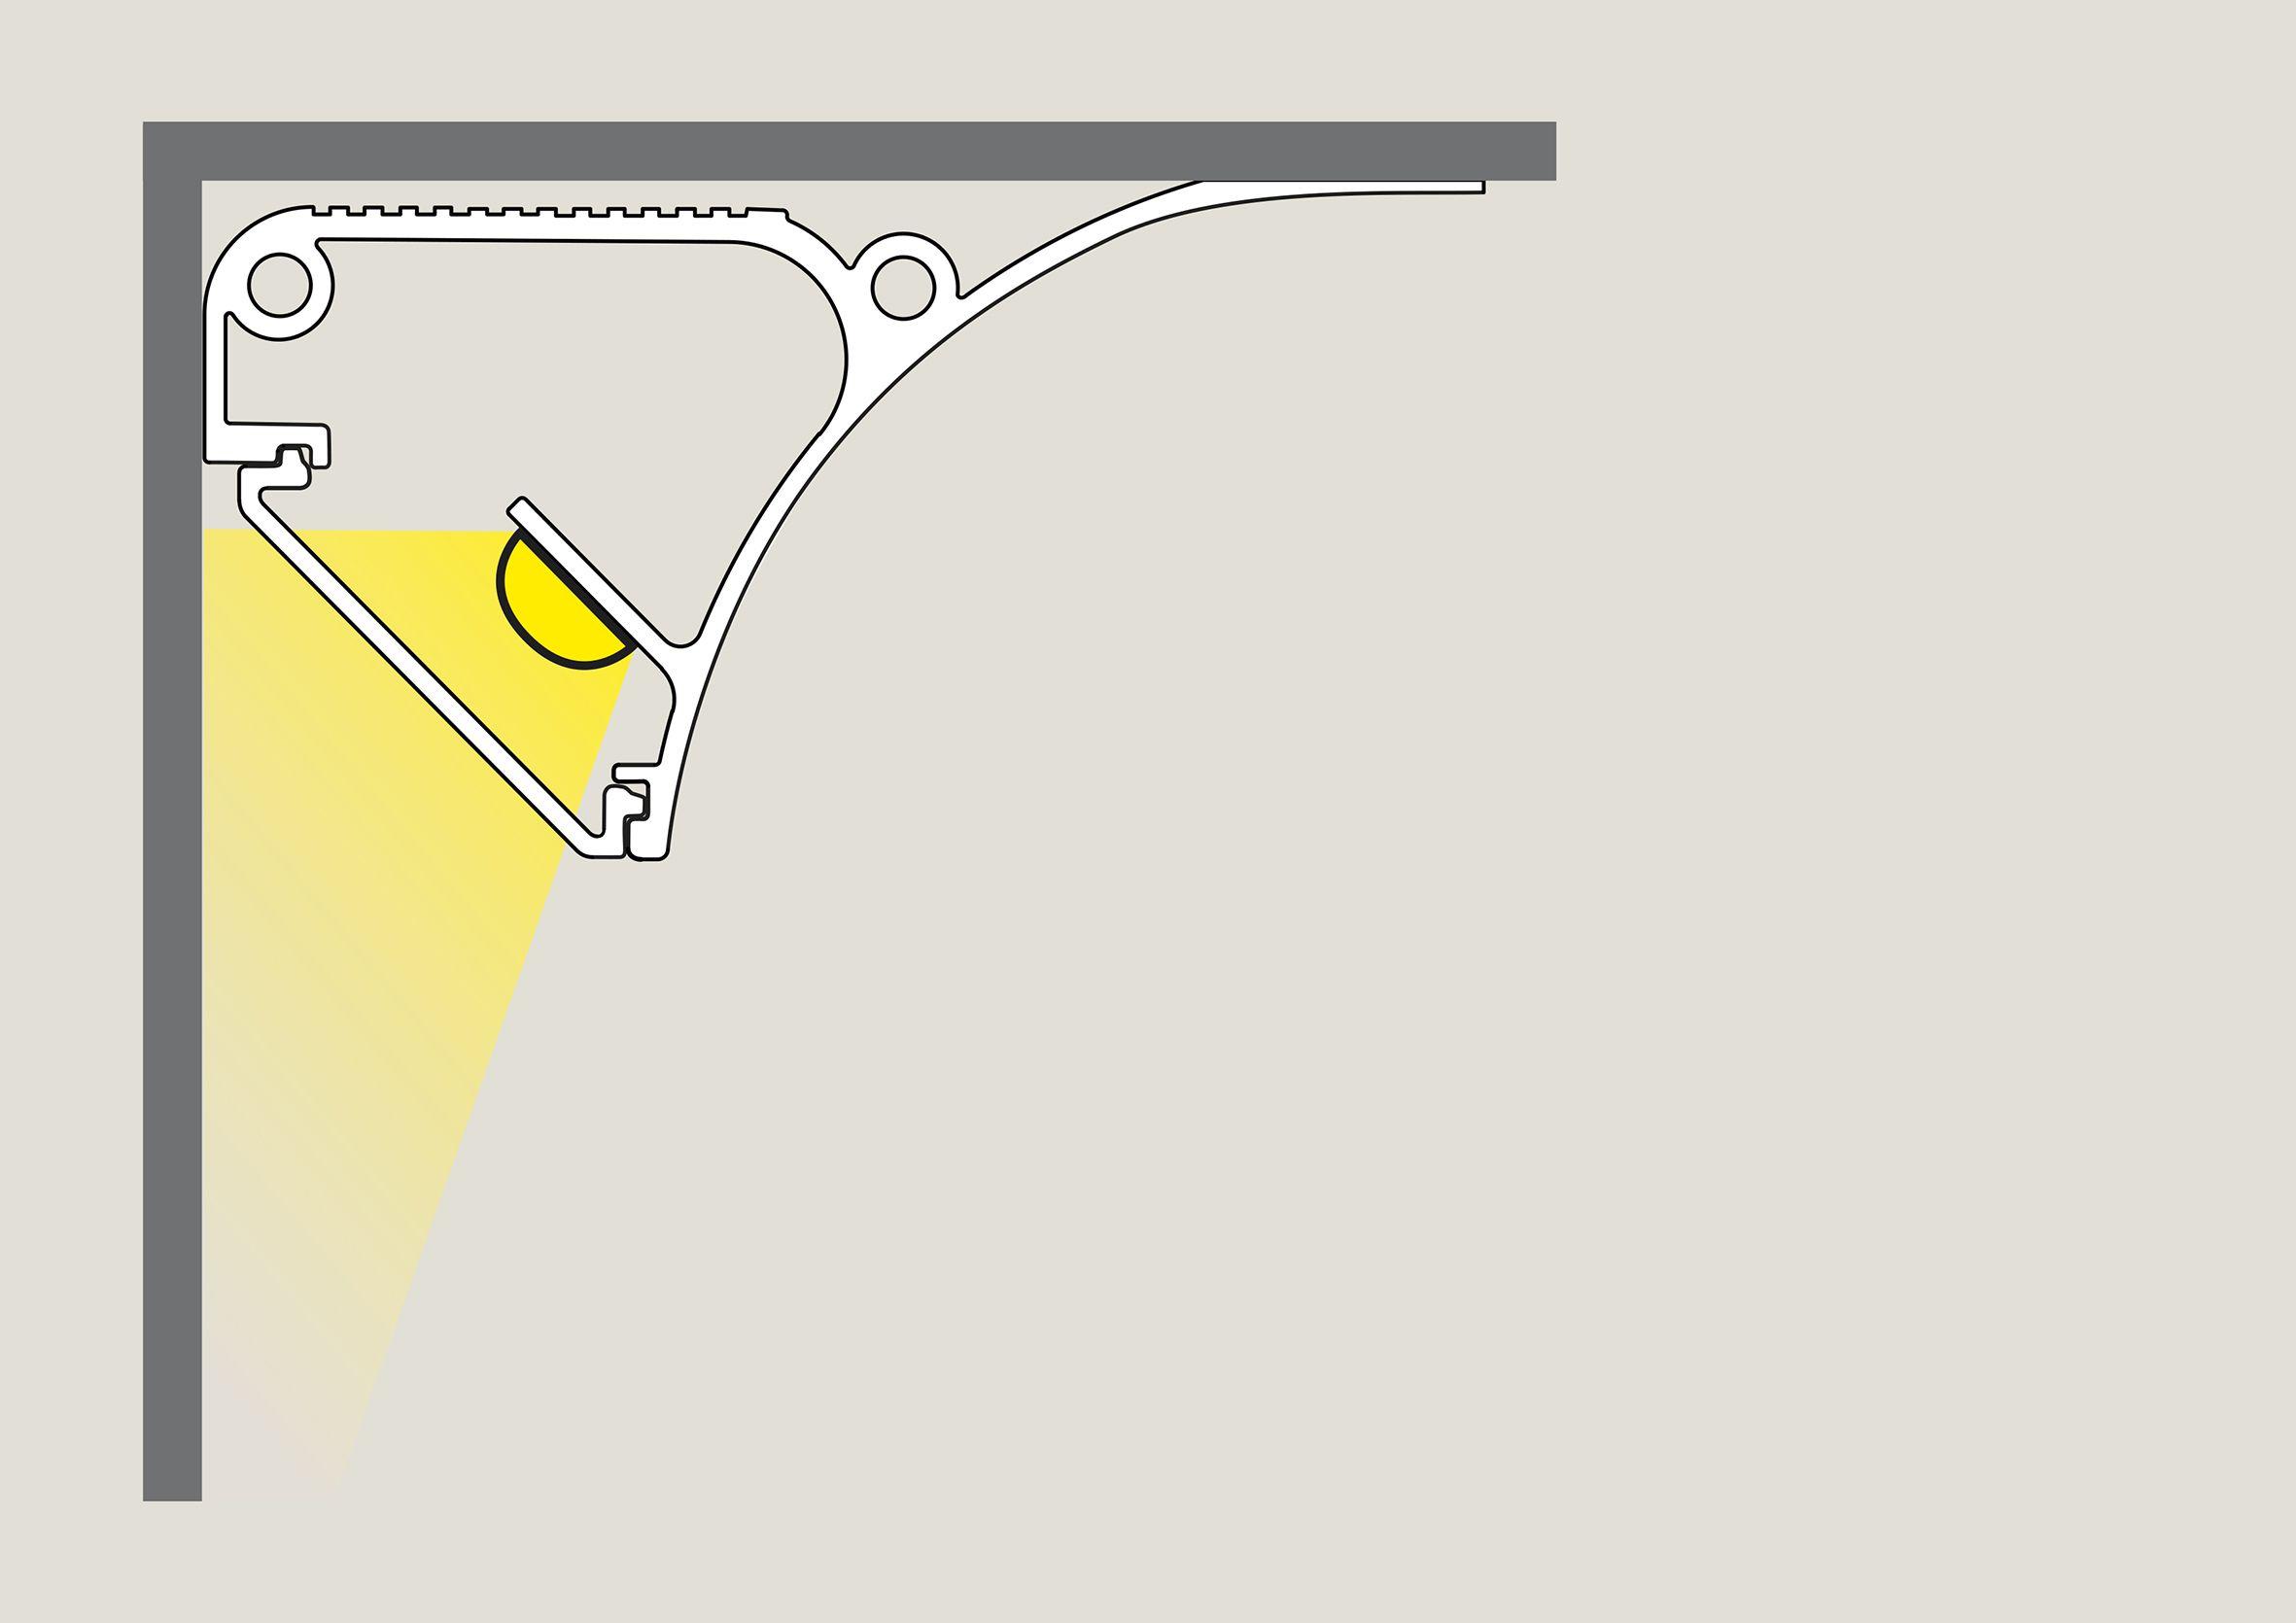 Led Licht In Profilen An Wand Decke Im Boden Oder Mobeln Beleuchtung Decke Led Licht Licht